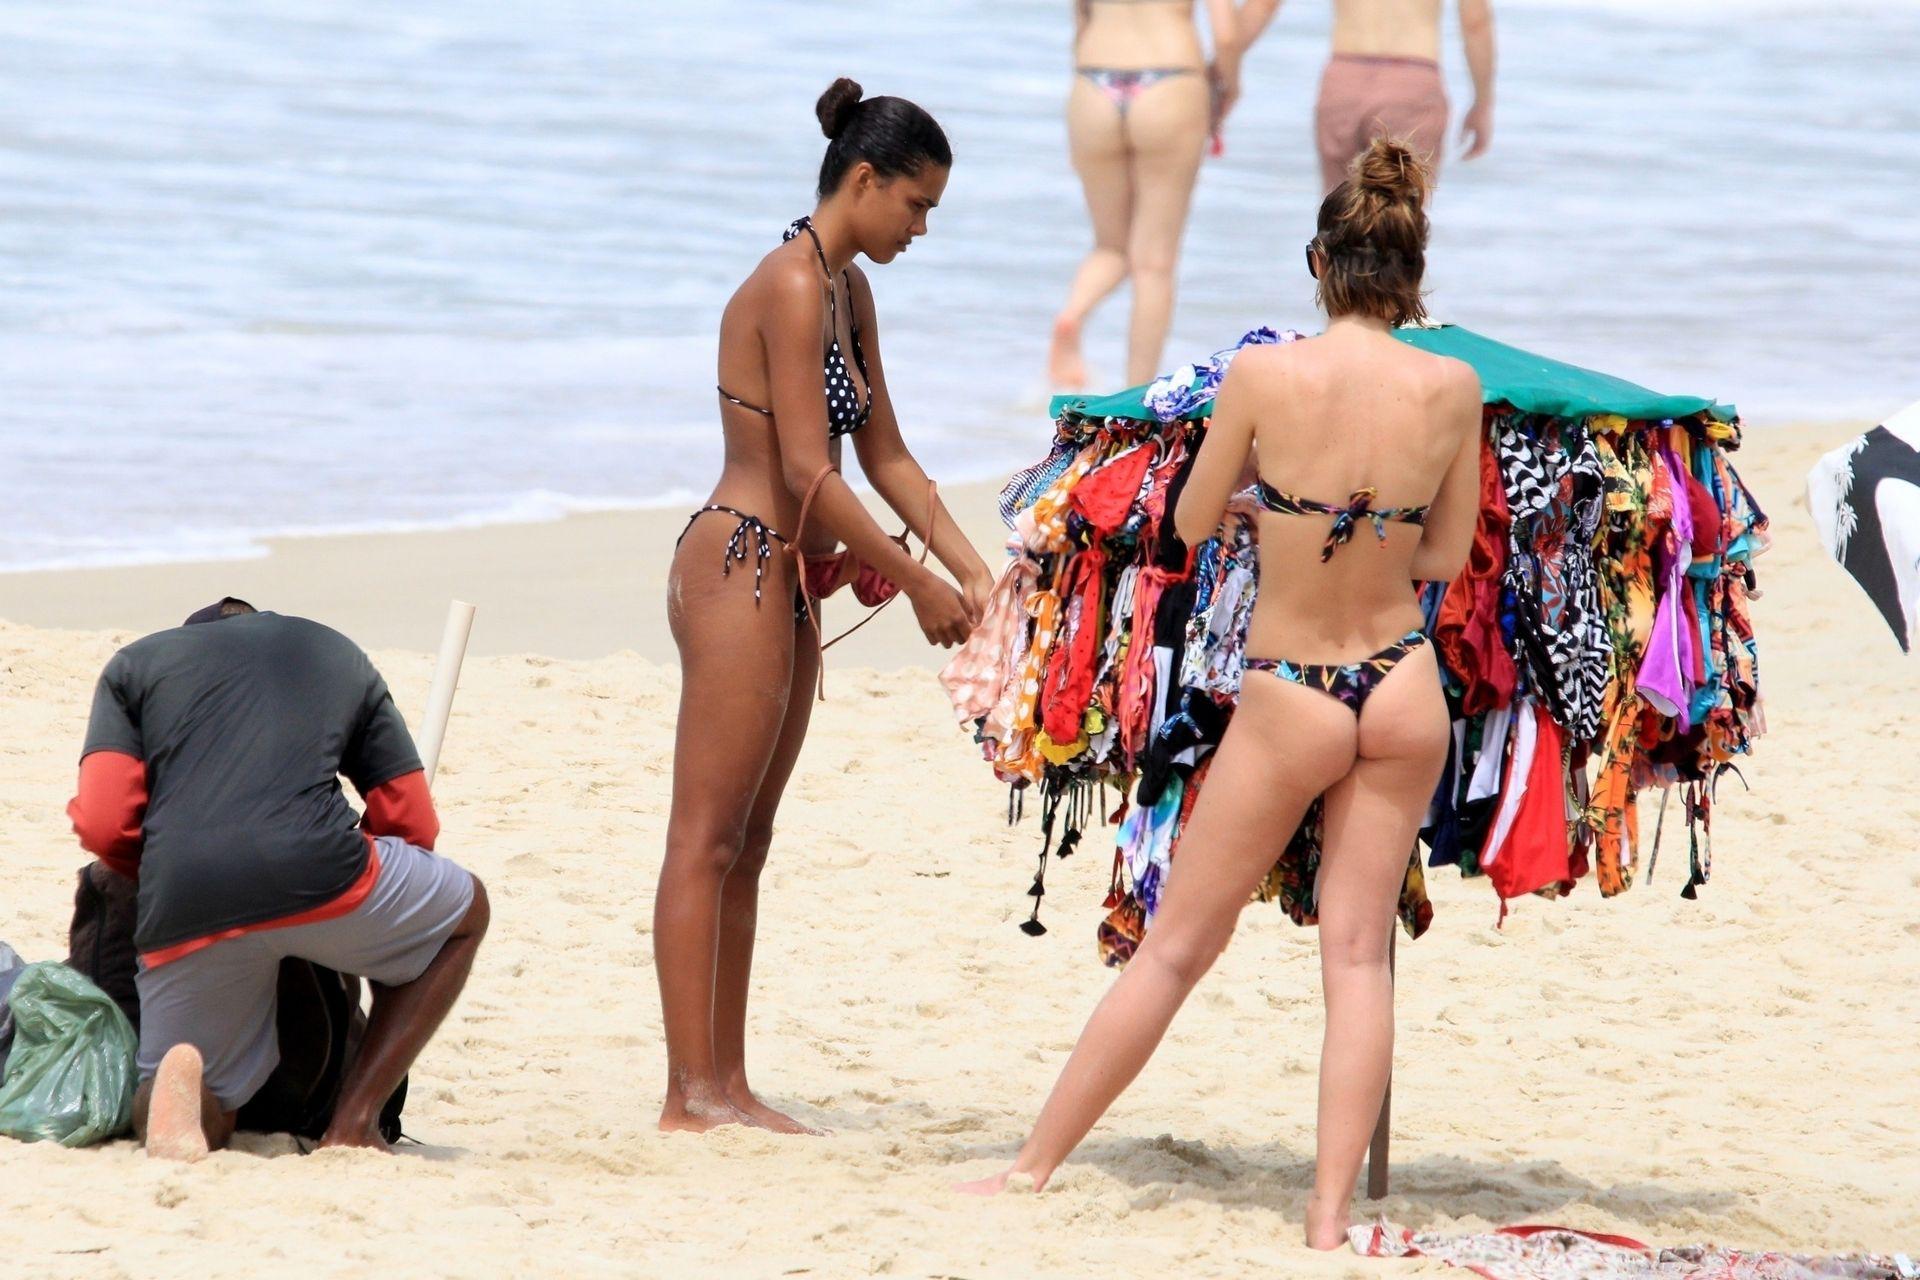 Tina Kunakey Nearly Nip Slip While Frolicking On The Beach In Rio 0063